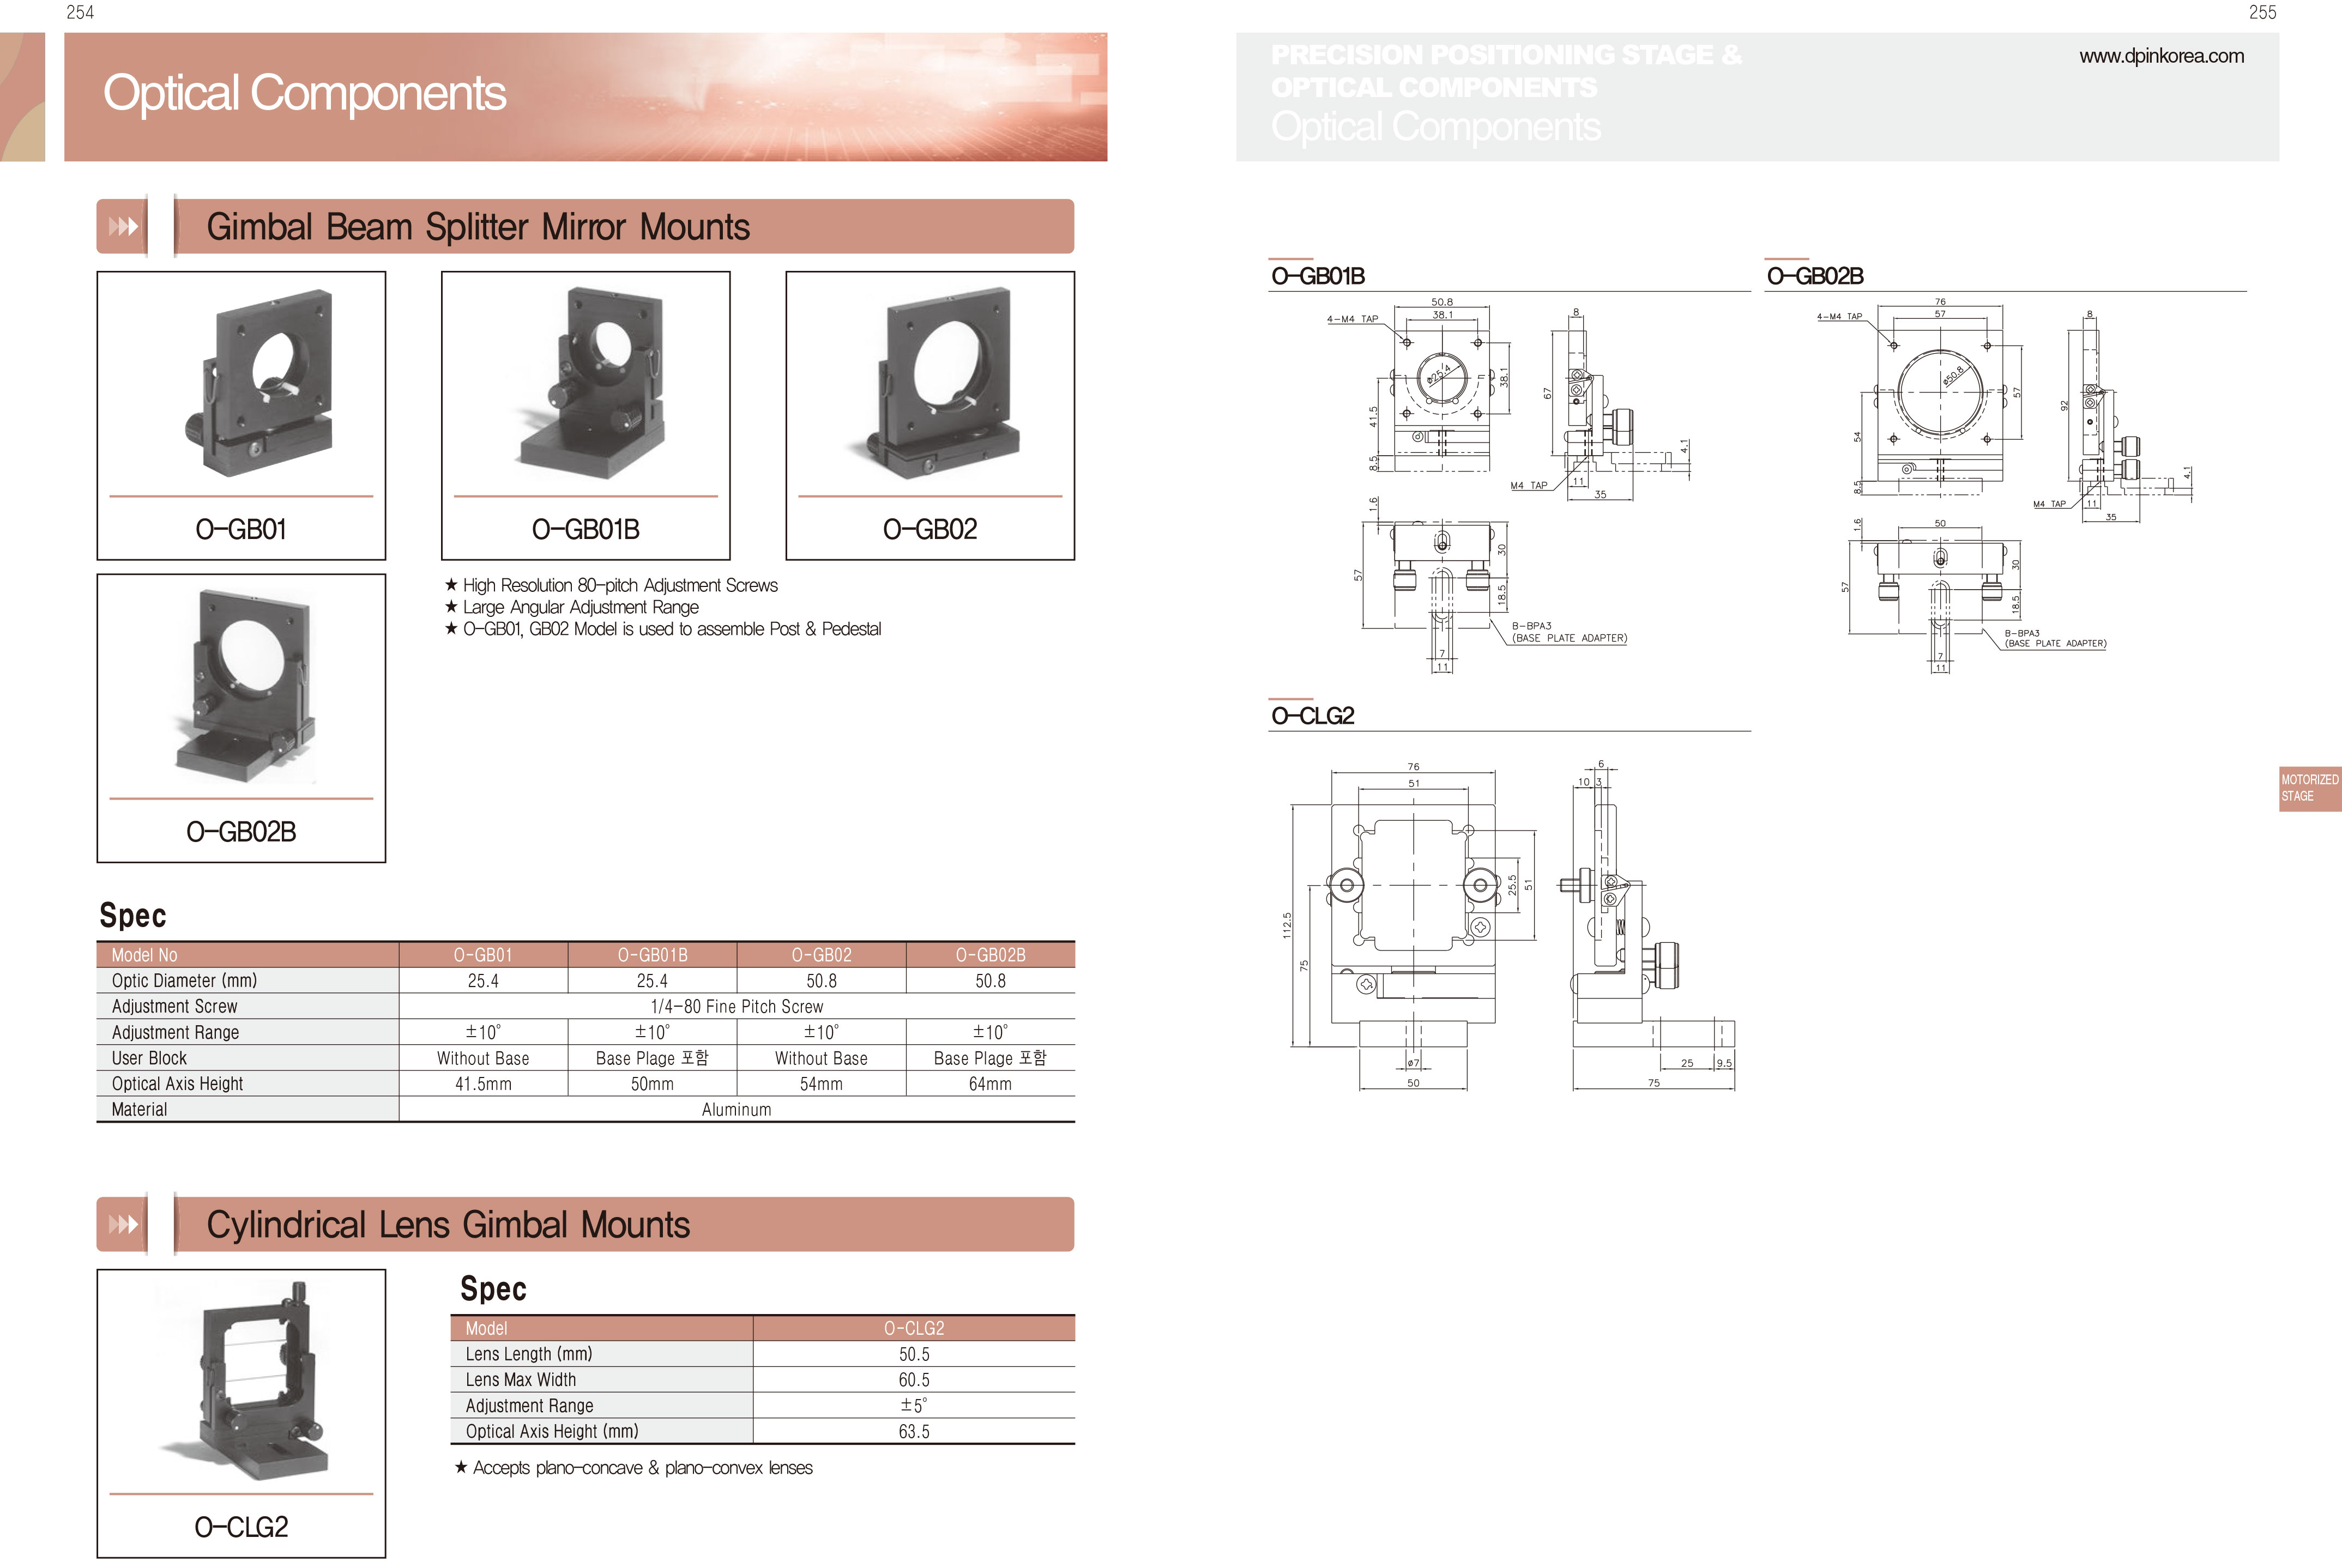 DPIN-Optical-光學元件-5